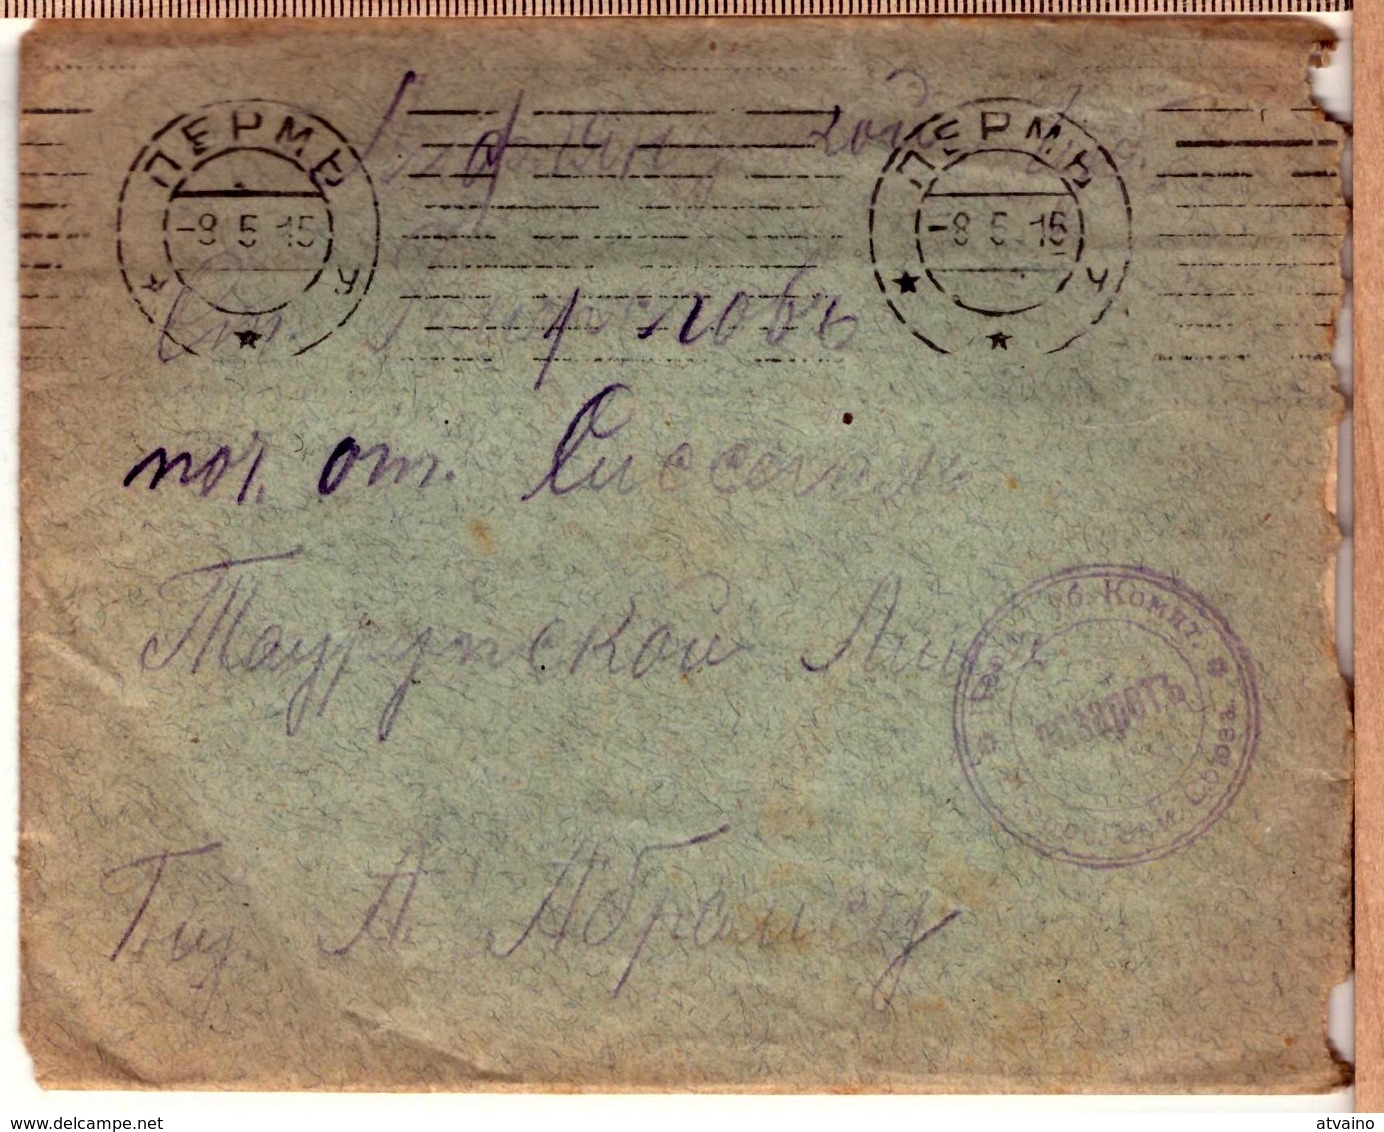 Russian Imperial Acting Army Special Pmk VSEROSIJSKIJ ZEM SOJUZ PERM GUB. 1915. - 1857-1916 Empire